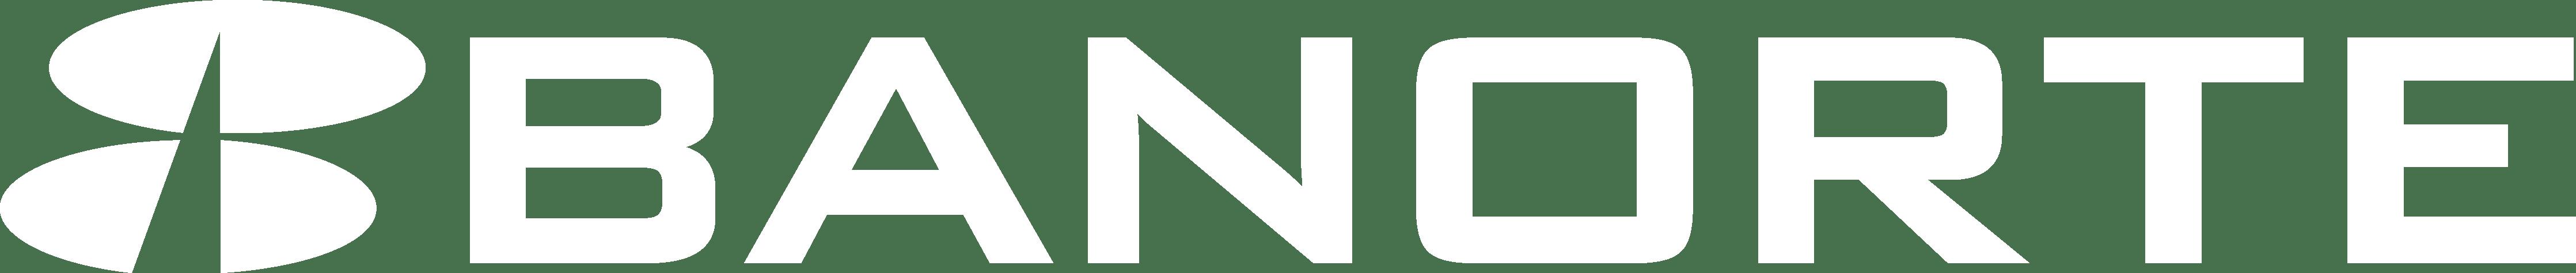 logo_banorte_2019-min